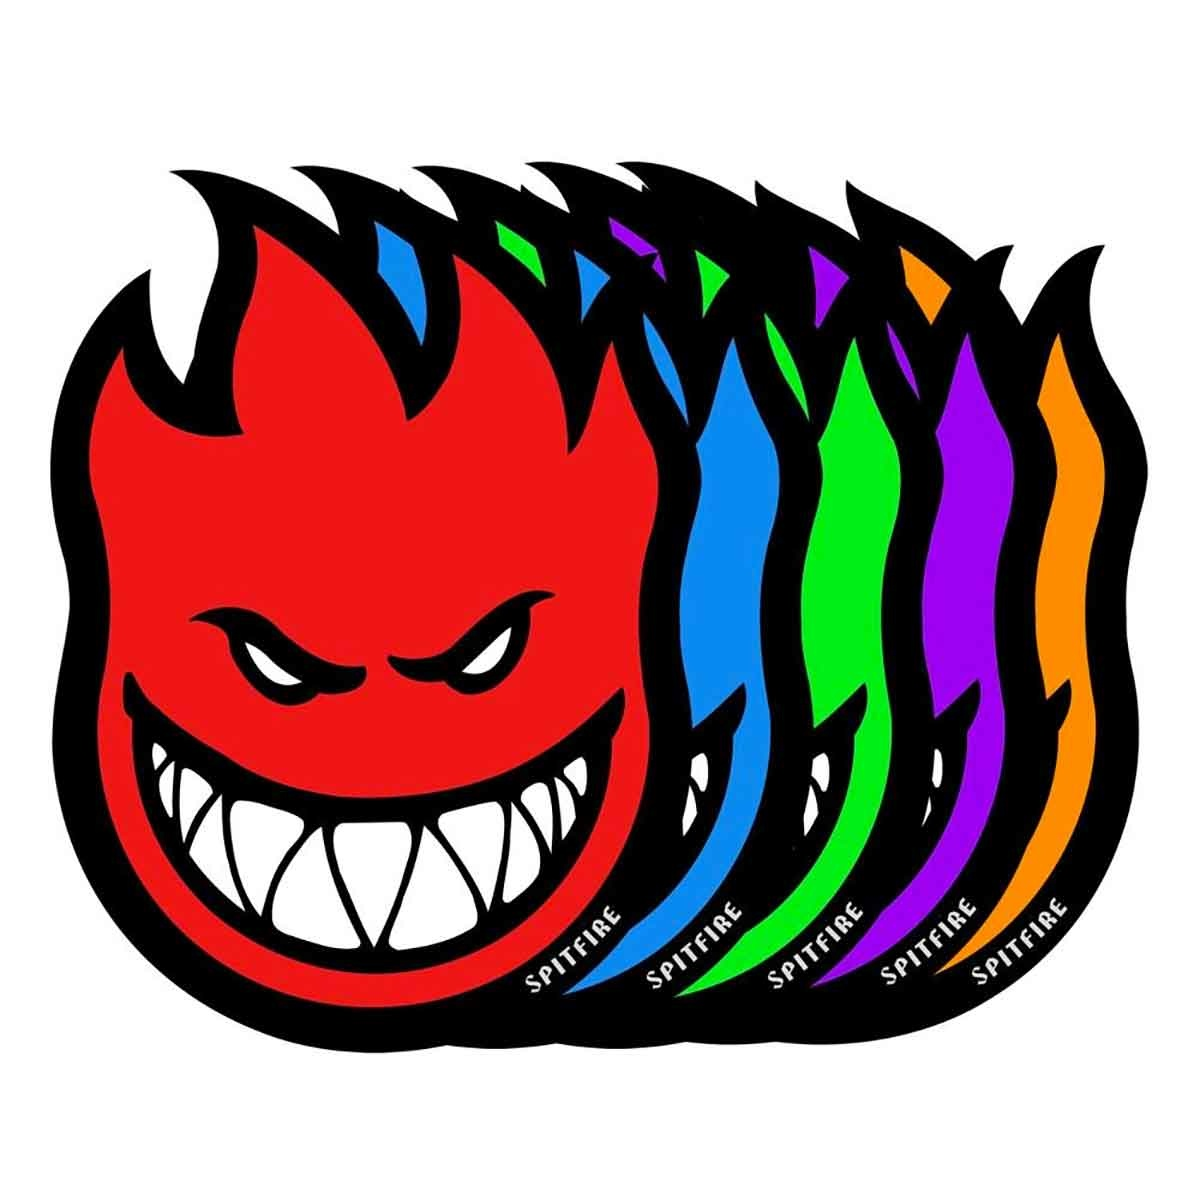 spitfire sf fireball 3in sticker